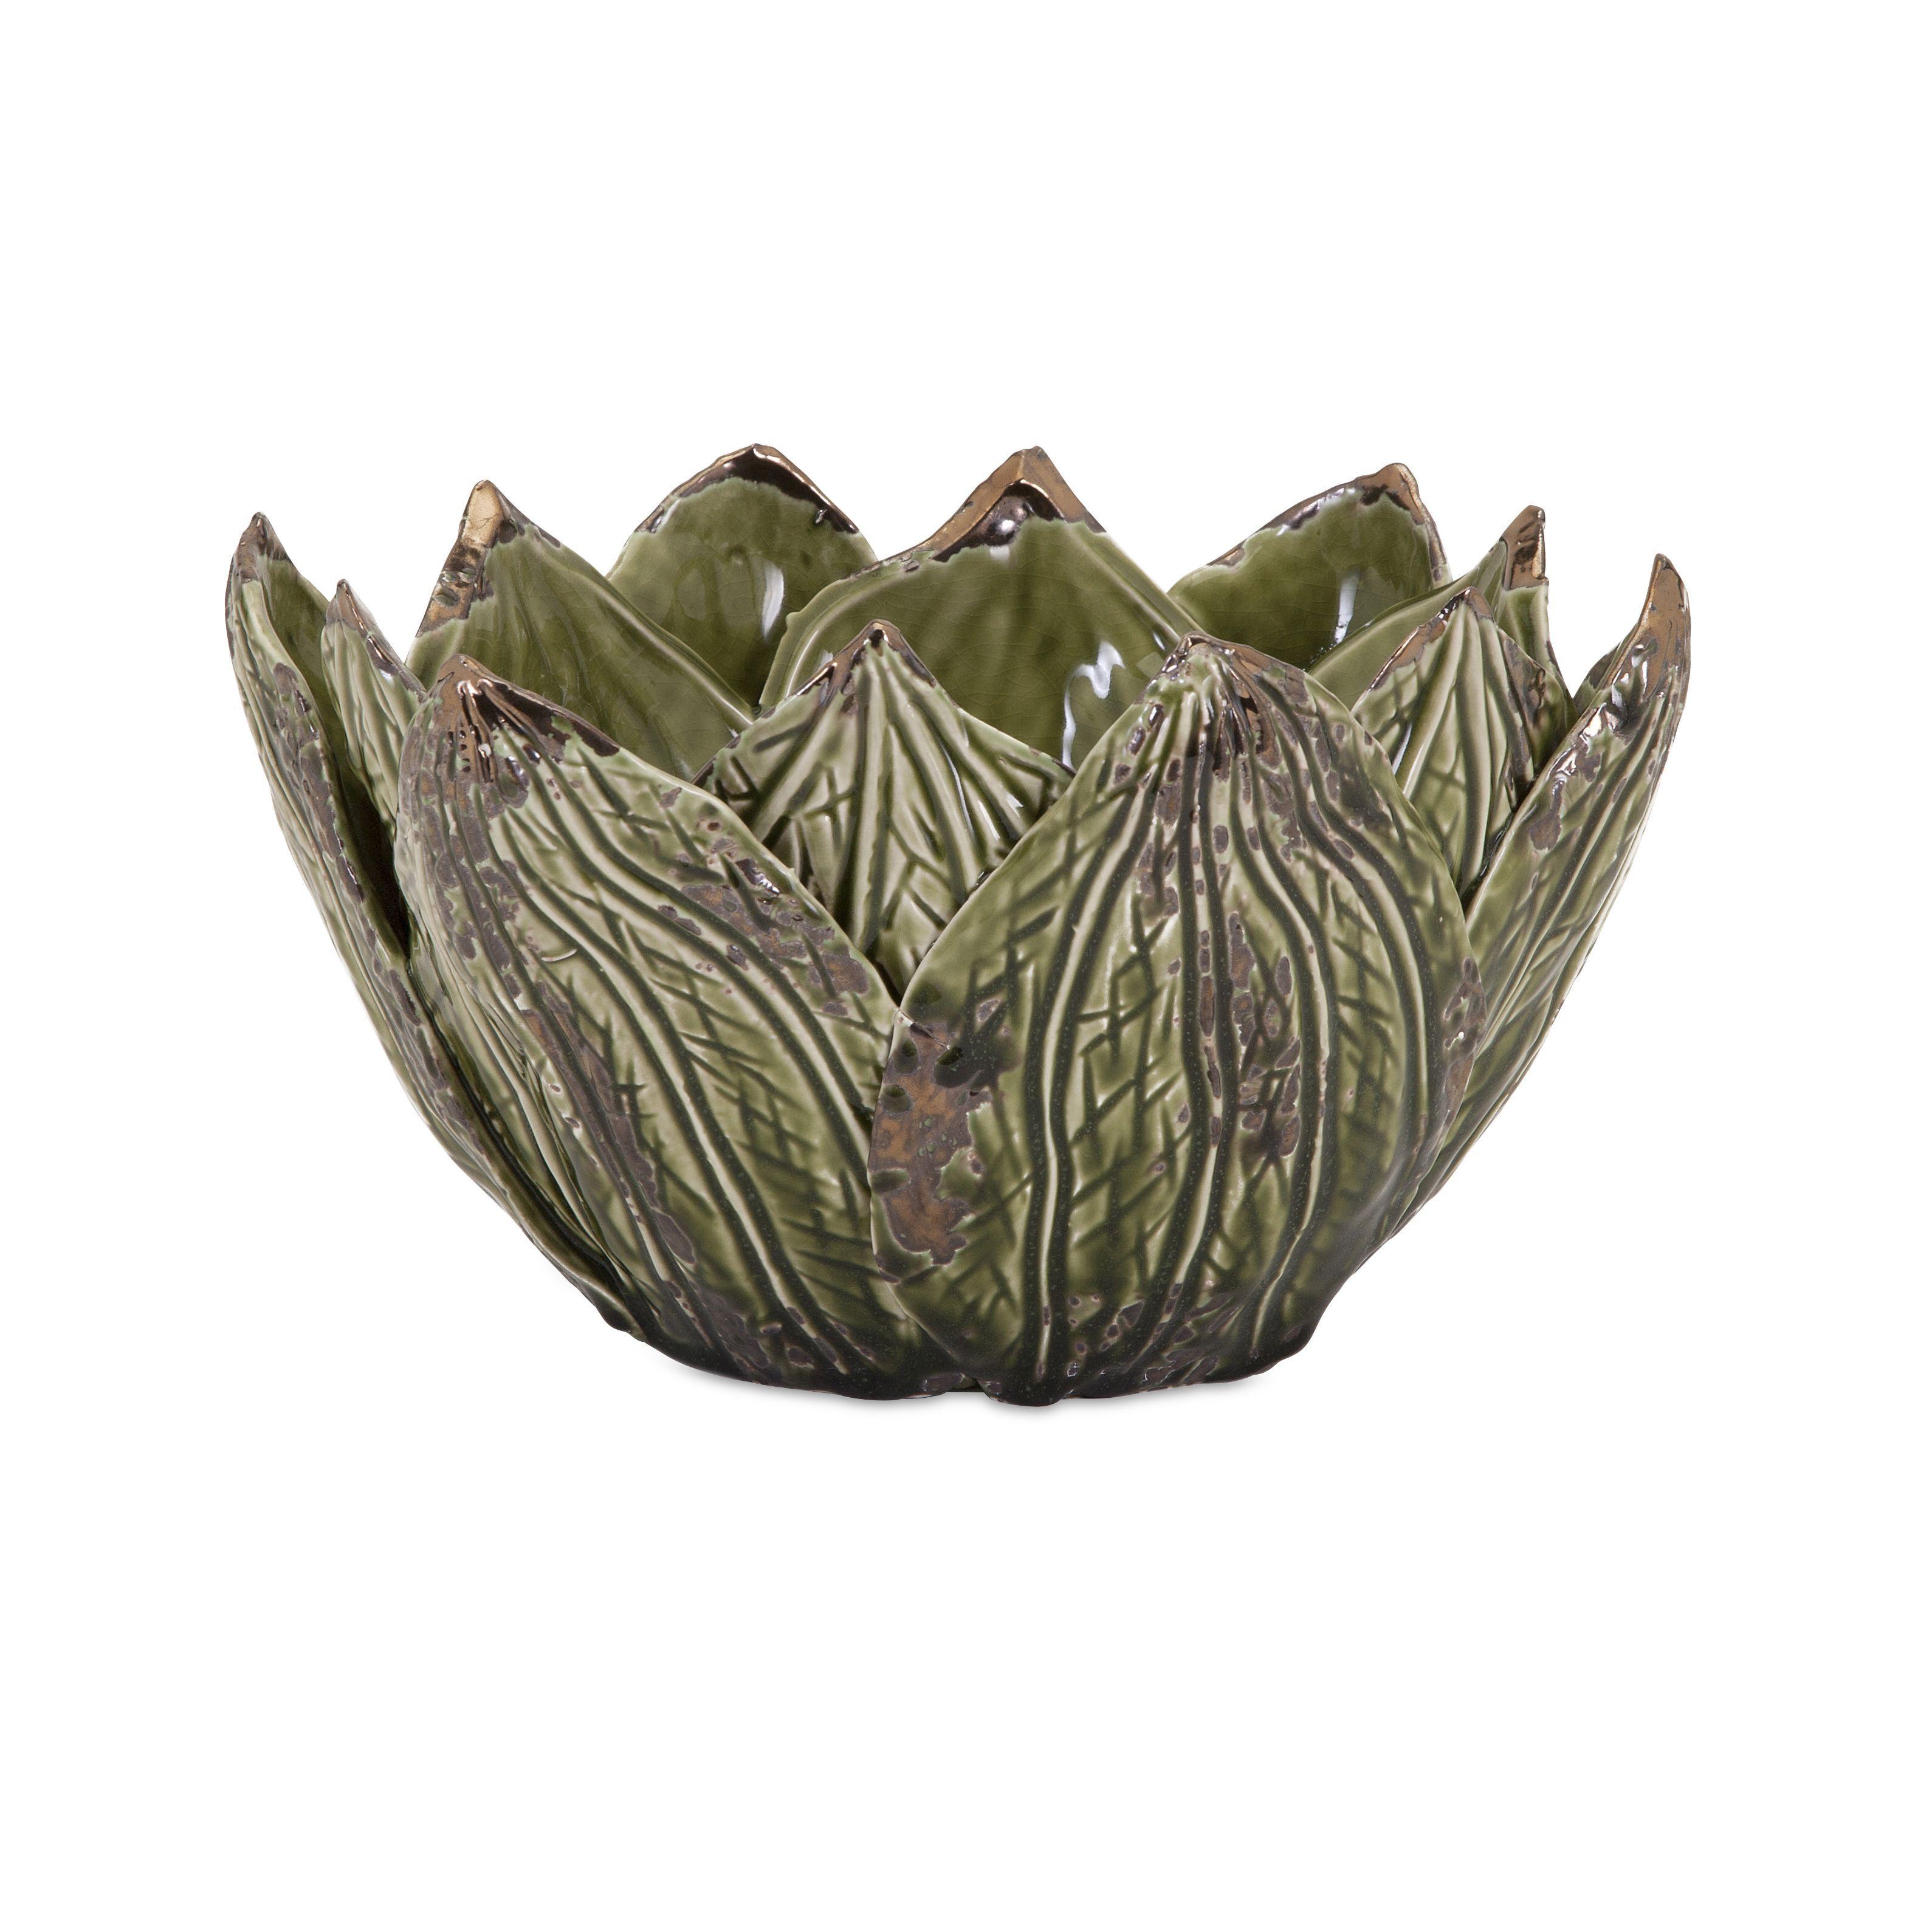 Soho wiley large vase greenpurple ceramic ceramics soho wiley large vase greenpurple ceramic reviewsmspy